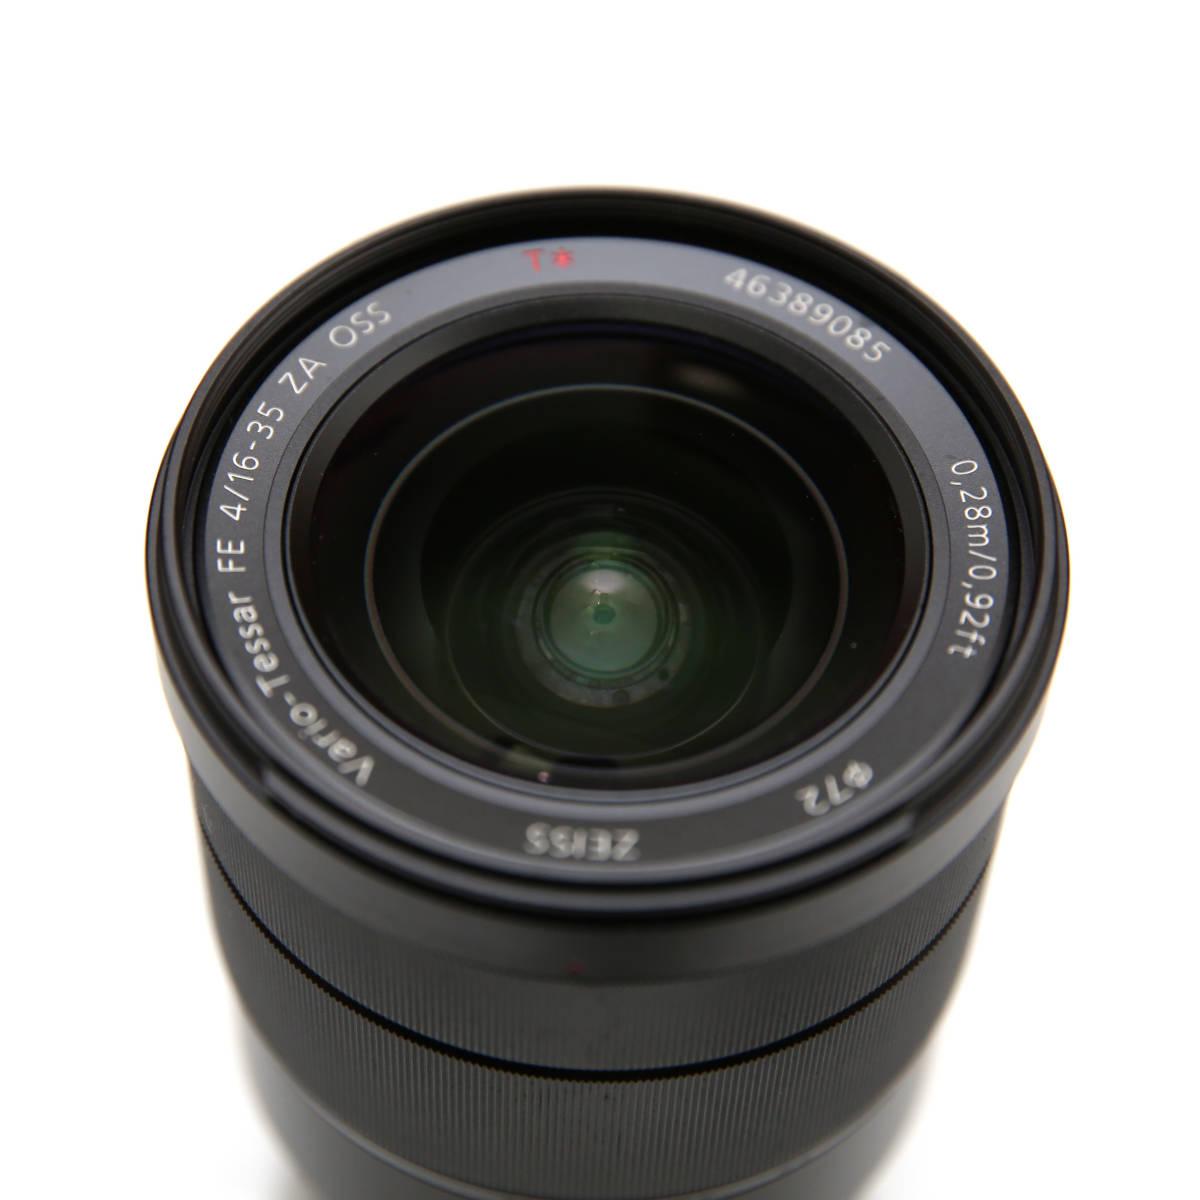 SONY 広角 Vario-Tessar T* FE 16-35mm F4 ZA OSS Eマウント35mmフルサイズ対応 SEL1635Z _画像3